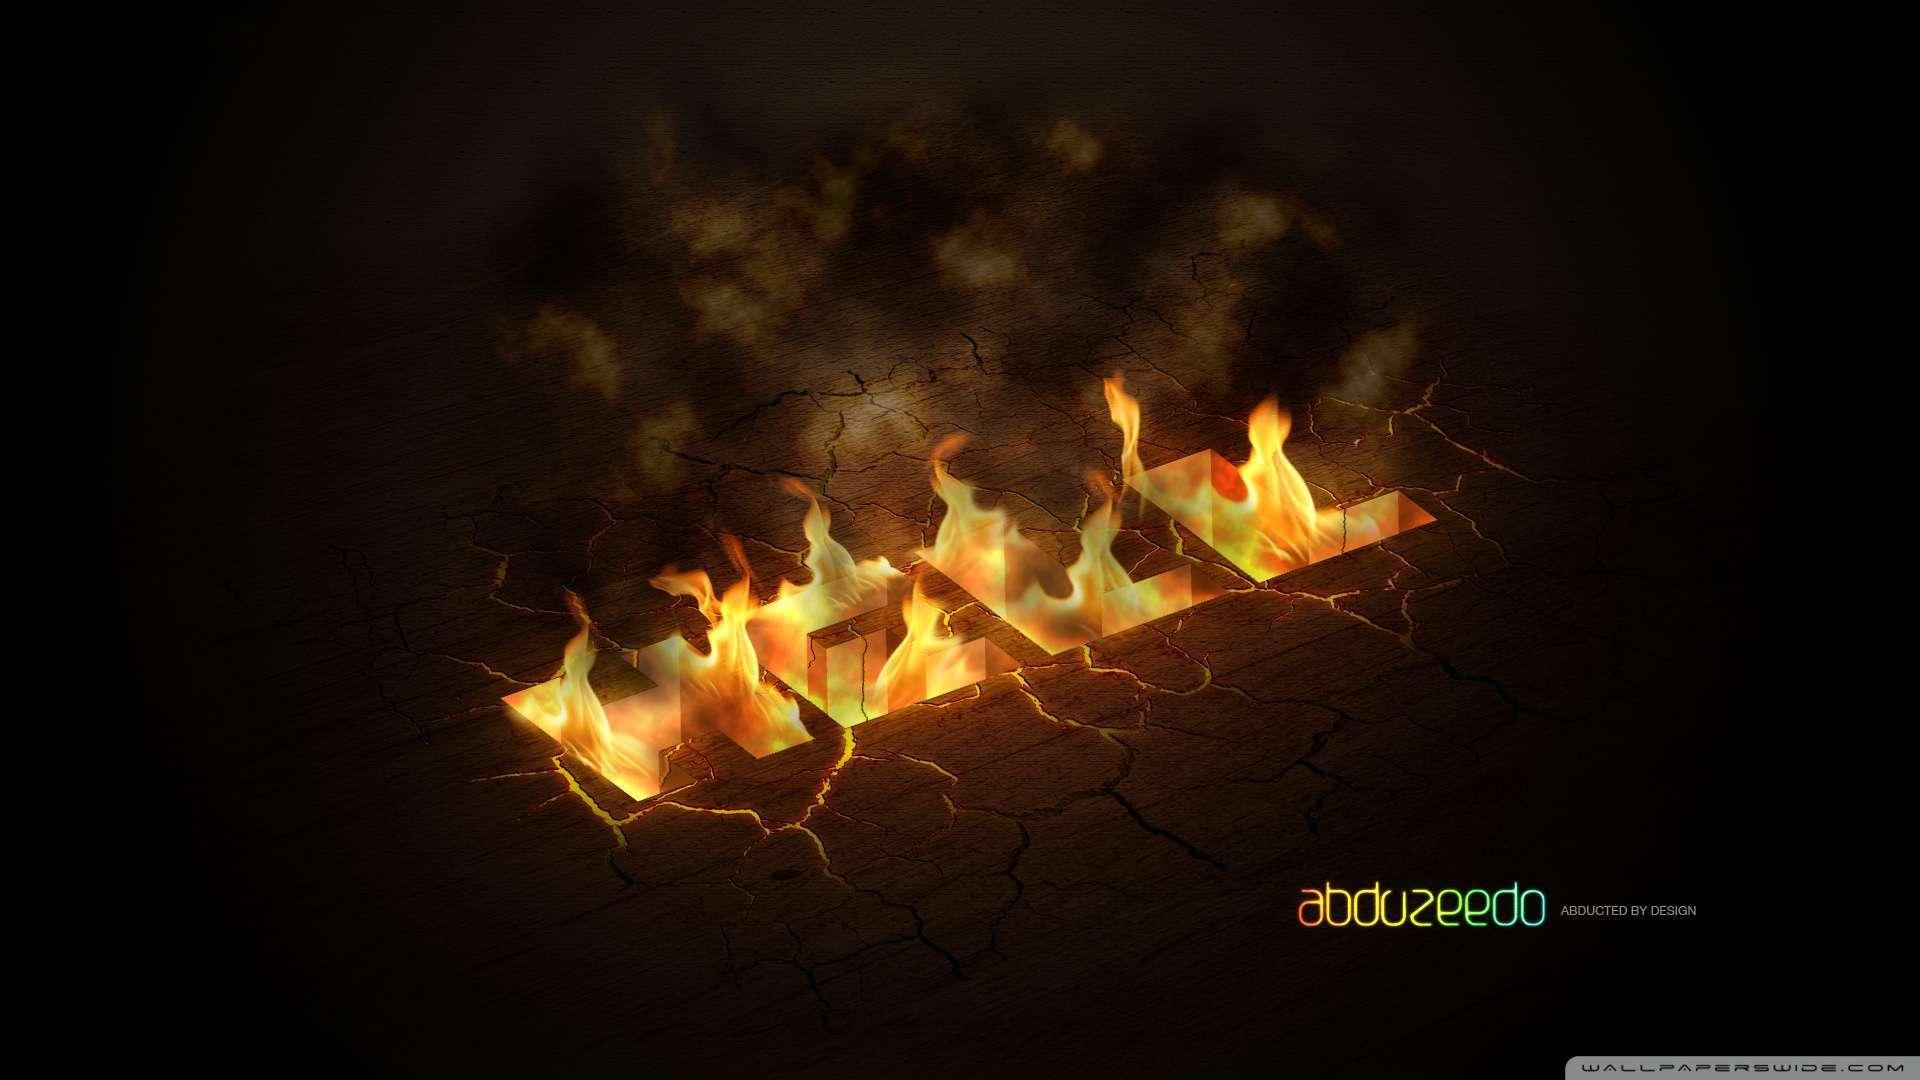 Wallpaper Burning Hell Wallpaper Hd 1080p Upload at April 9 2014 by 1920x1080